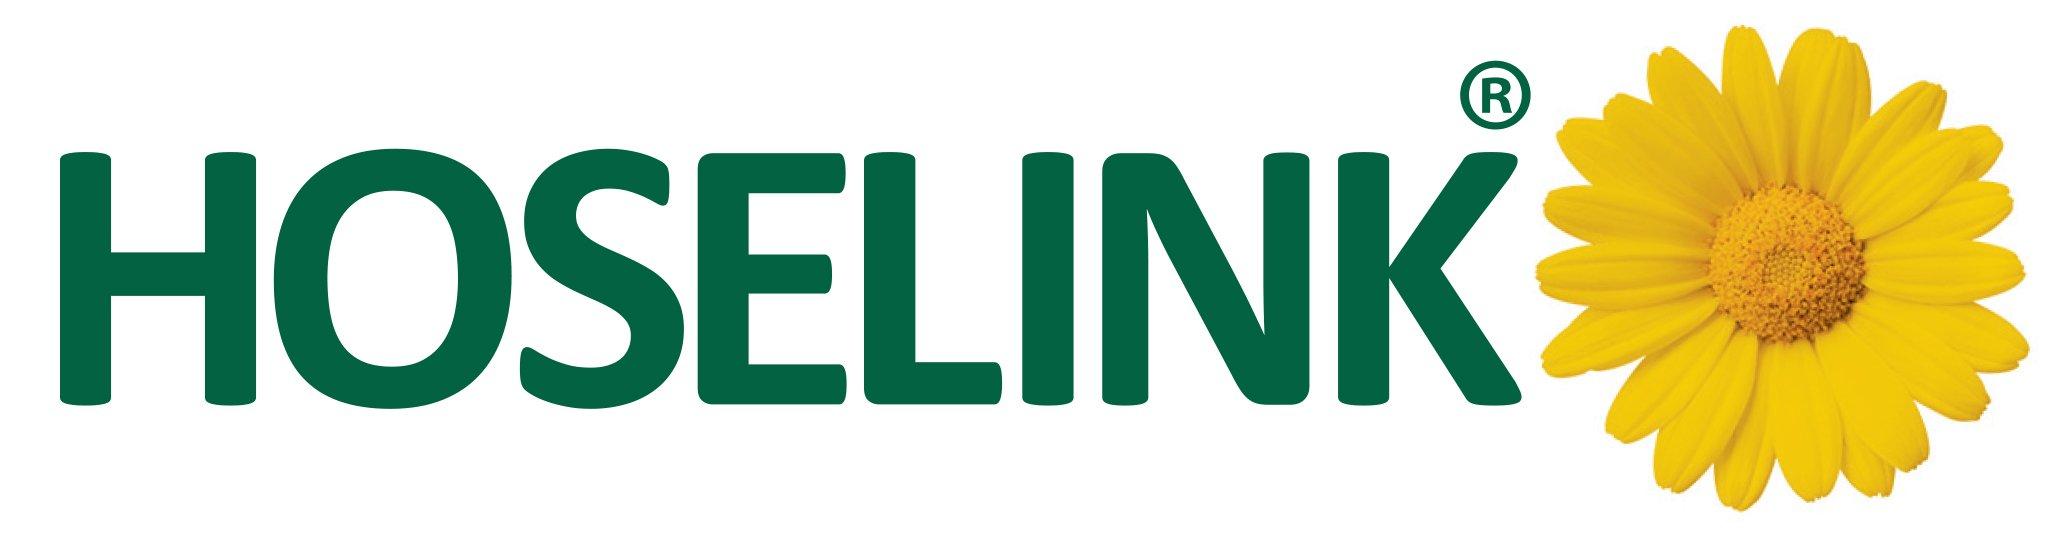 Hoselink logo